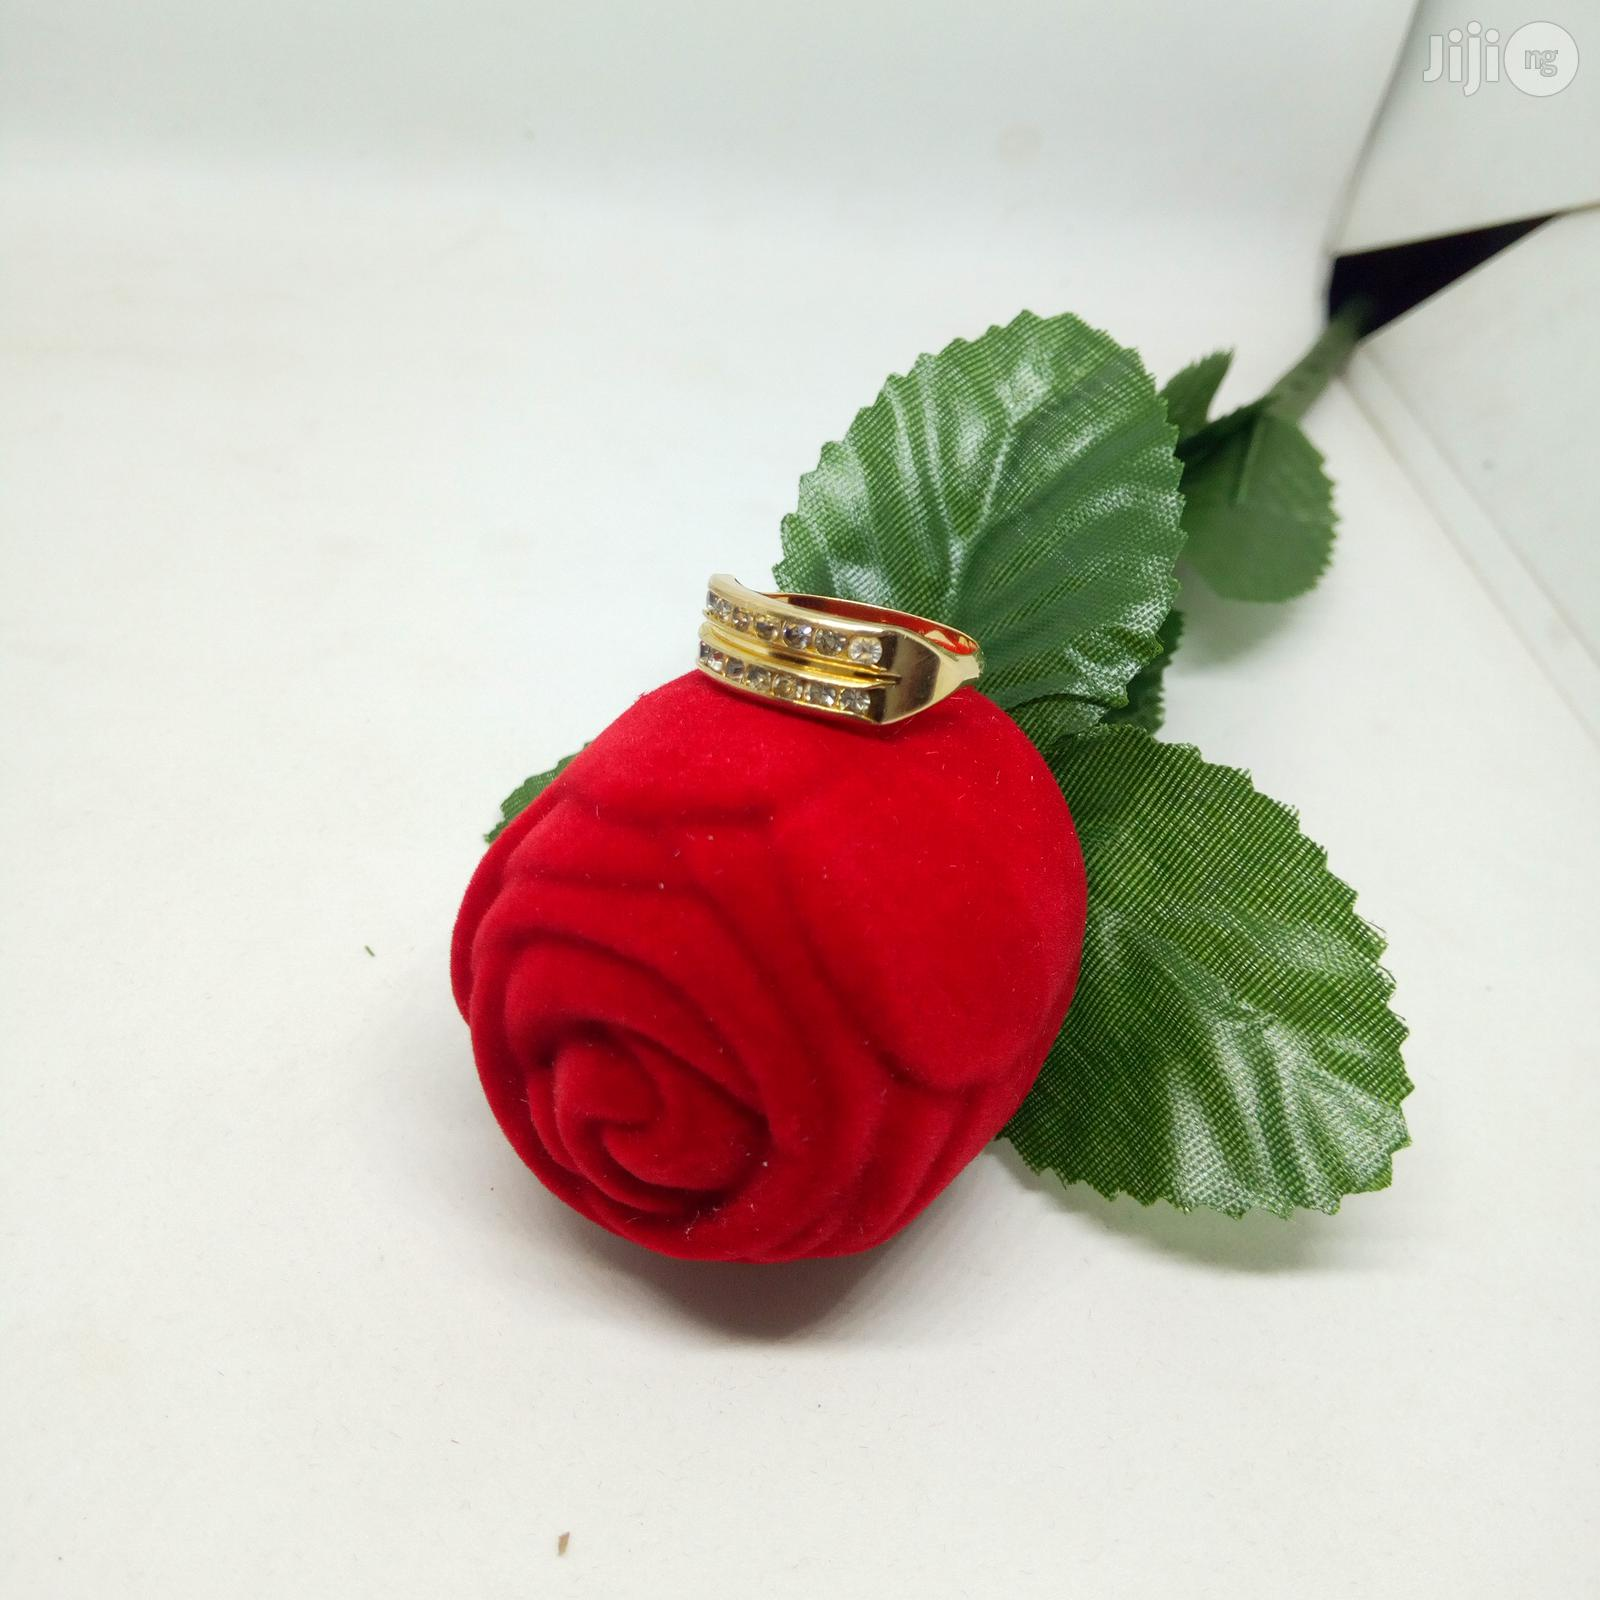 Brand New Original Romania Gold Engagement Ring | Wedding Wear & Accessories for sale in Ojodu, Lagos State, Nigeria